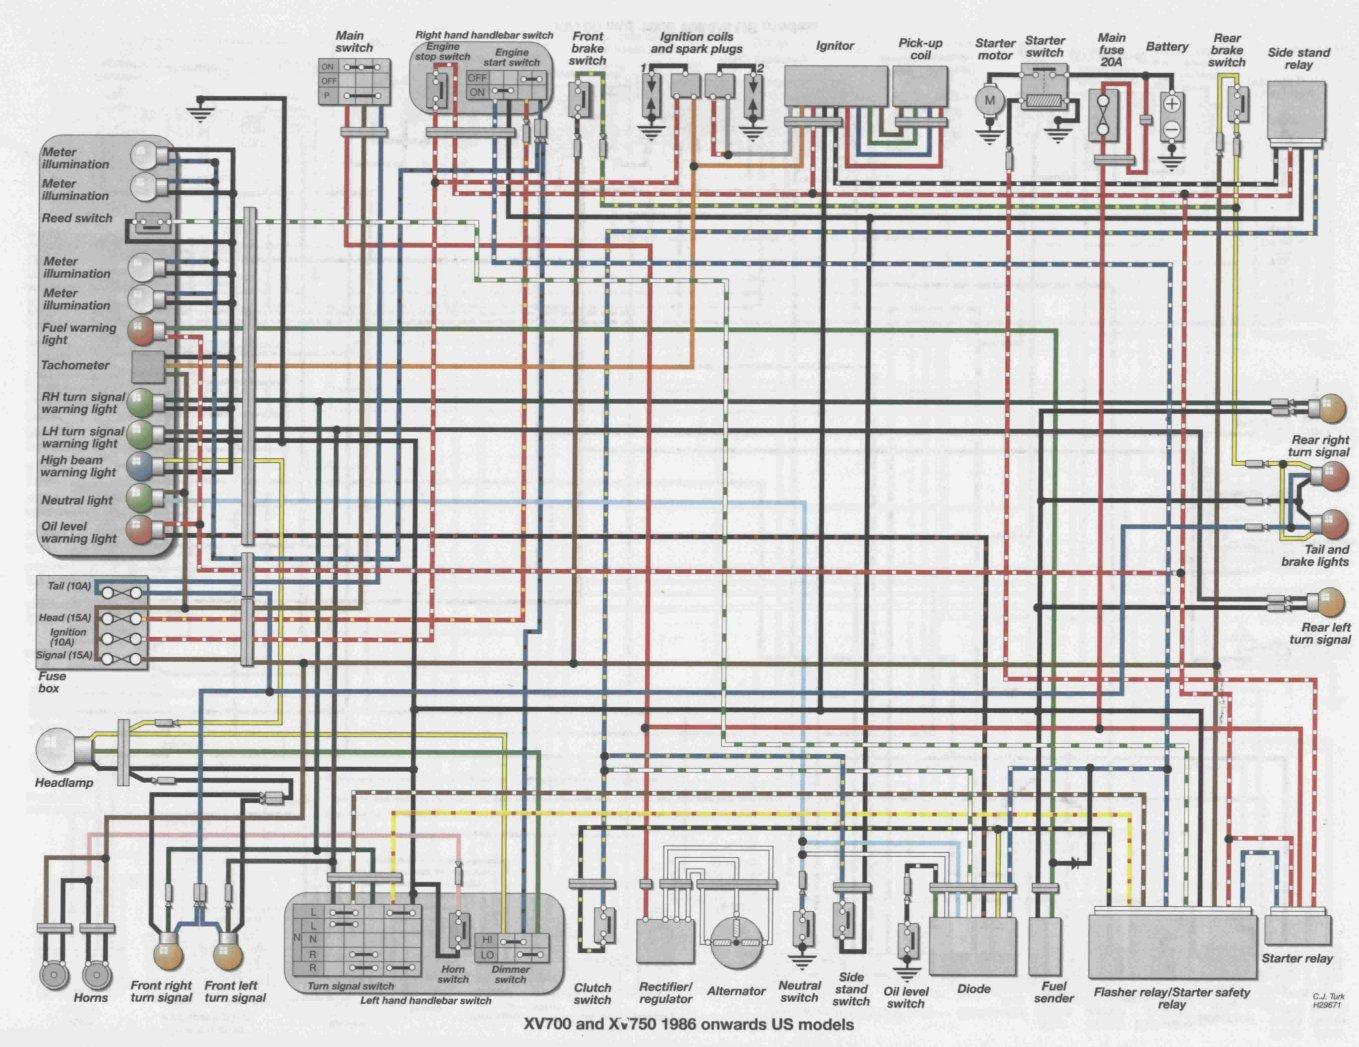 [QNCB_7524]  NG_8436] Honda Shadow 750 Wiring Diagram Manual Engine Schematics And Wiring  Schematic Wiring   Vt 750 Wiring Diagram      Phot Drosi Benkeme Mohammedshrine Librar Wiring 101